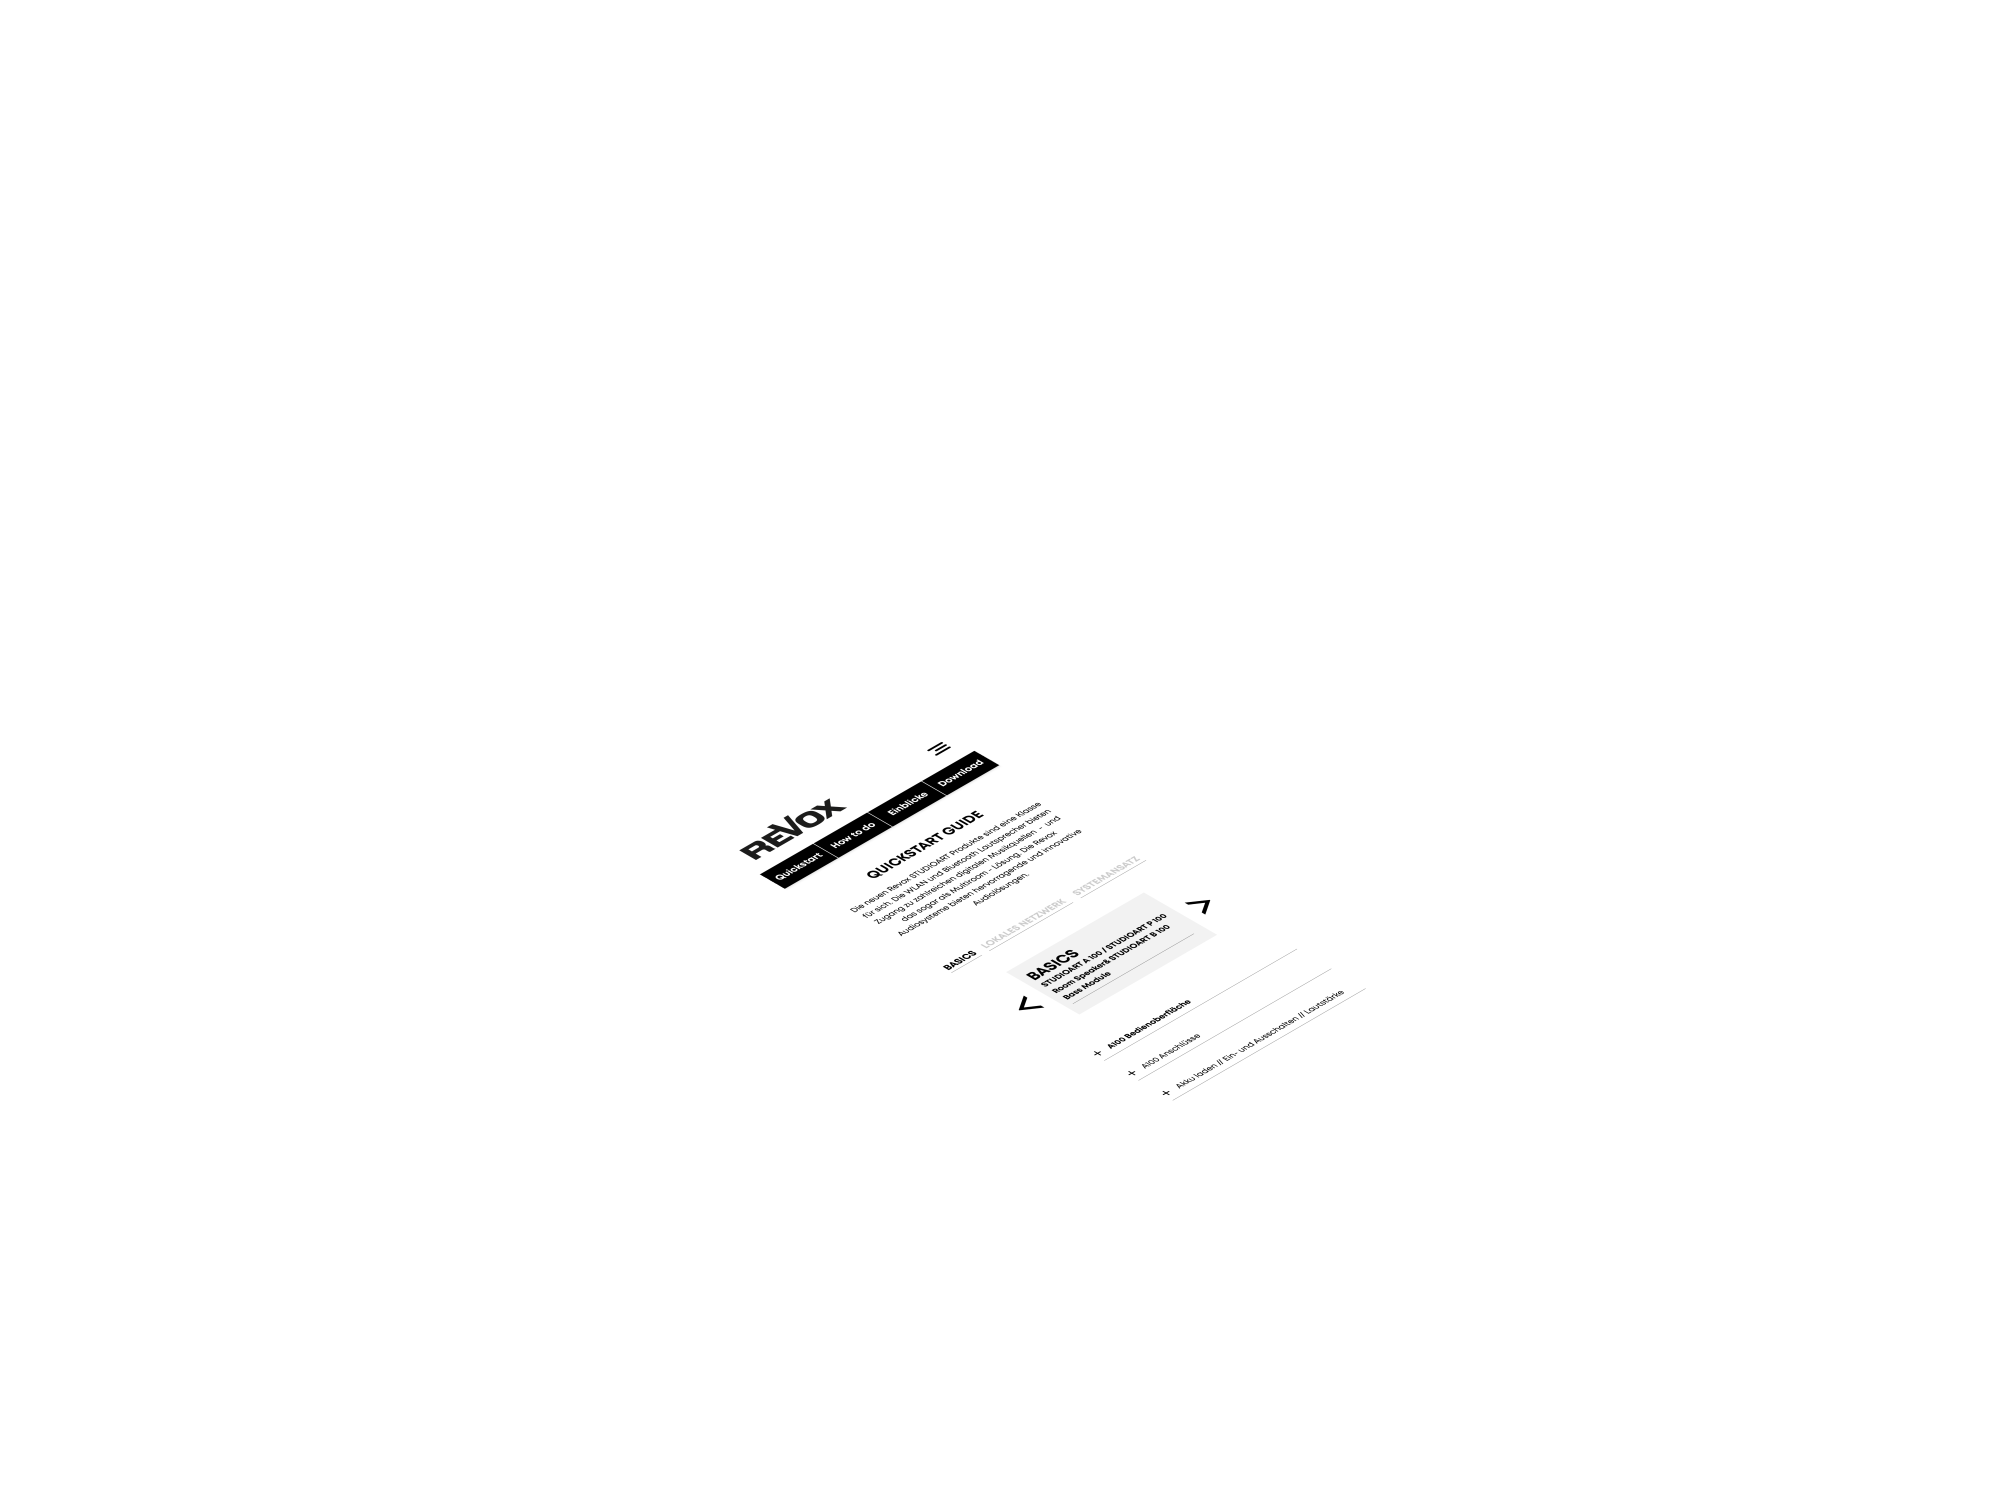 Werbeagentur - Kreativagentur - Digitalagentur - Designagentur - Schober Bonina AG - Schweiz - Basel - Digitale Marketingmassnahmen - Online Markeing - Offline Marketing - Digital Brand Strategy - Brand Experience - Communication Strategy - Customer Journey Design - Marketing Automation - Campaign Development - Integrated Campaigns - Content Strategie - Social Media Strategy - Social Media Marketing - Influencer Marketing - Cross Media Planning - Cross Media Buying - Data Strategy - Web Analytics - Marketing Technology - Display Advertising - Video Advertising - Native Advertising - Social Advertising - Dashboard Reporting - Dasboard Optimization - Dynamic Creative Optimization - Social Commerce